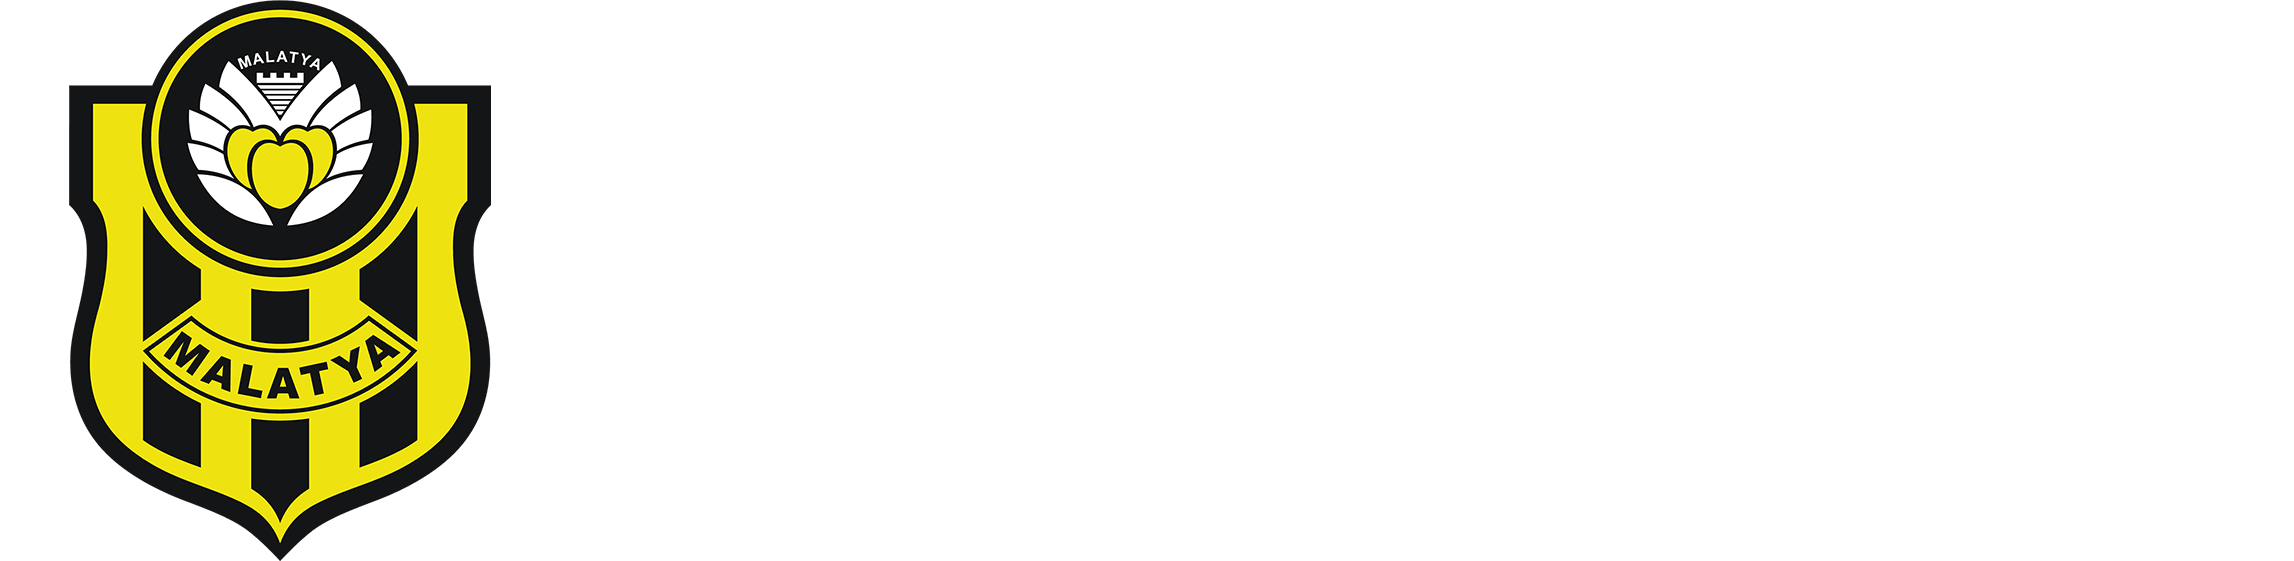 Yeni Malatyaspor Resmi Satýþ Maðazasý